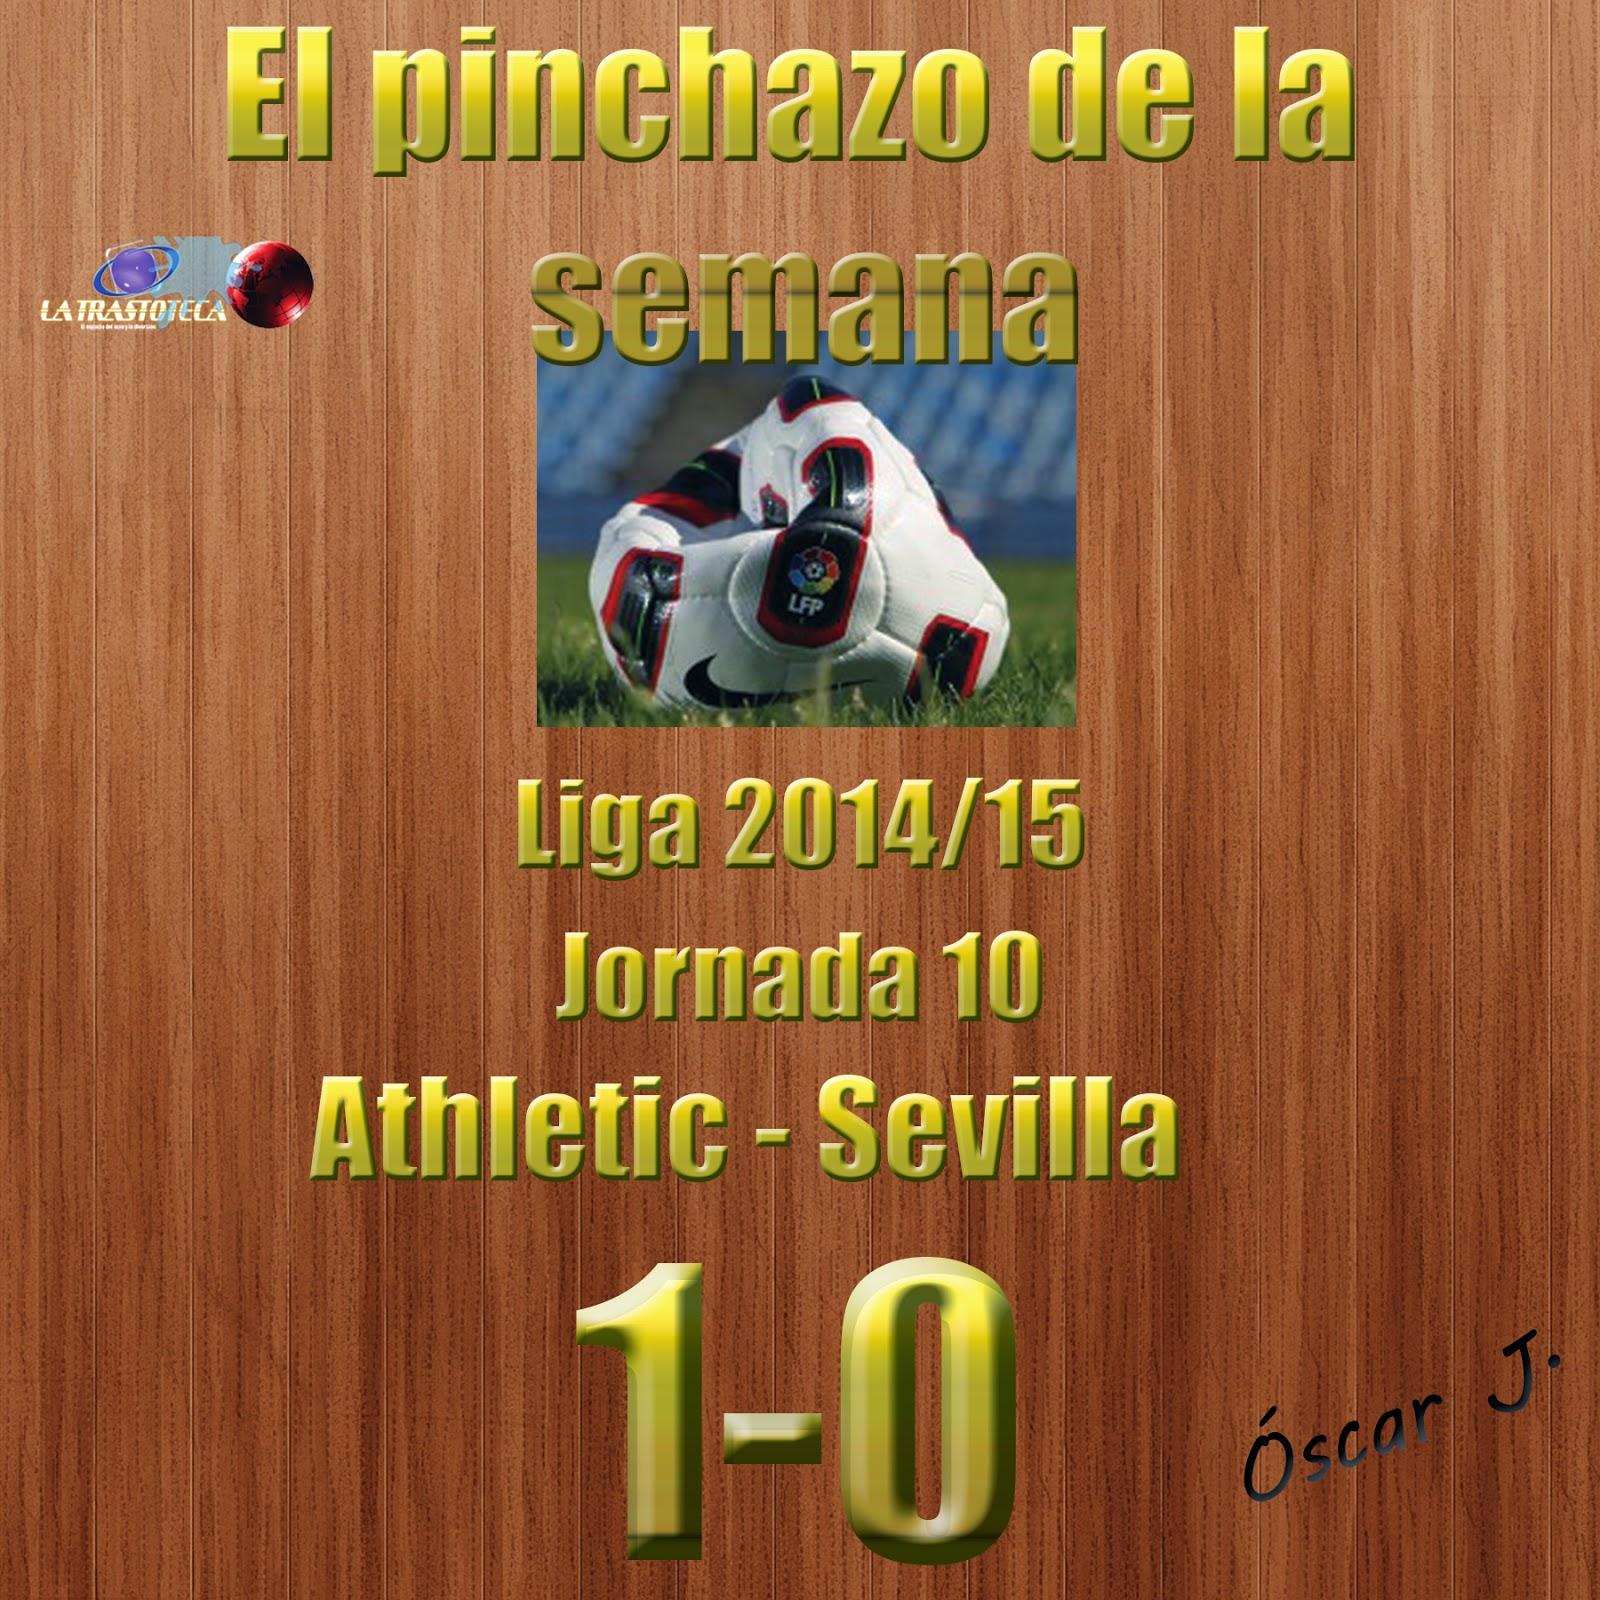 Athletic 1-0 Sevilla. Liga 2014/15 - Jornada 10. El pinchazo de la semana.